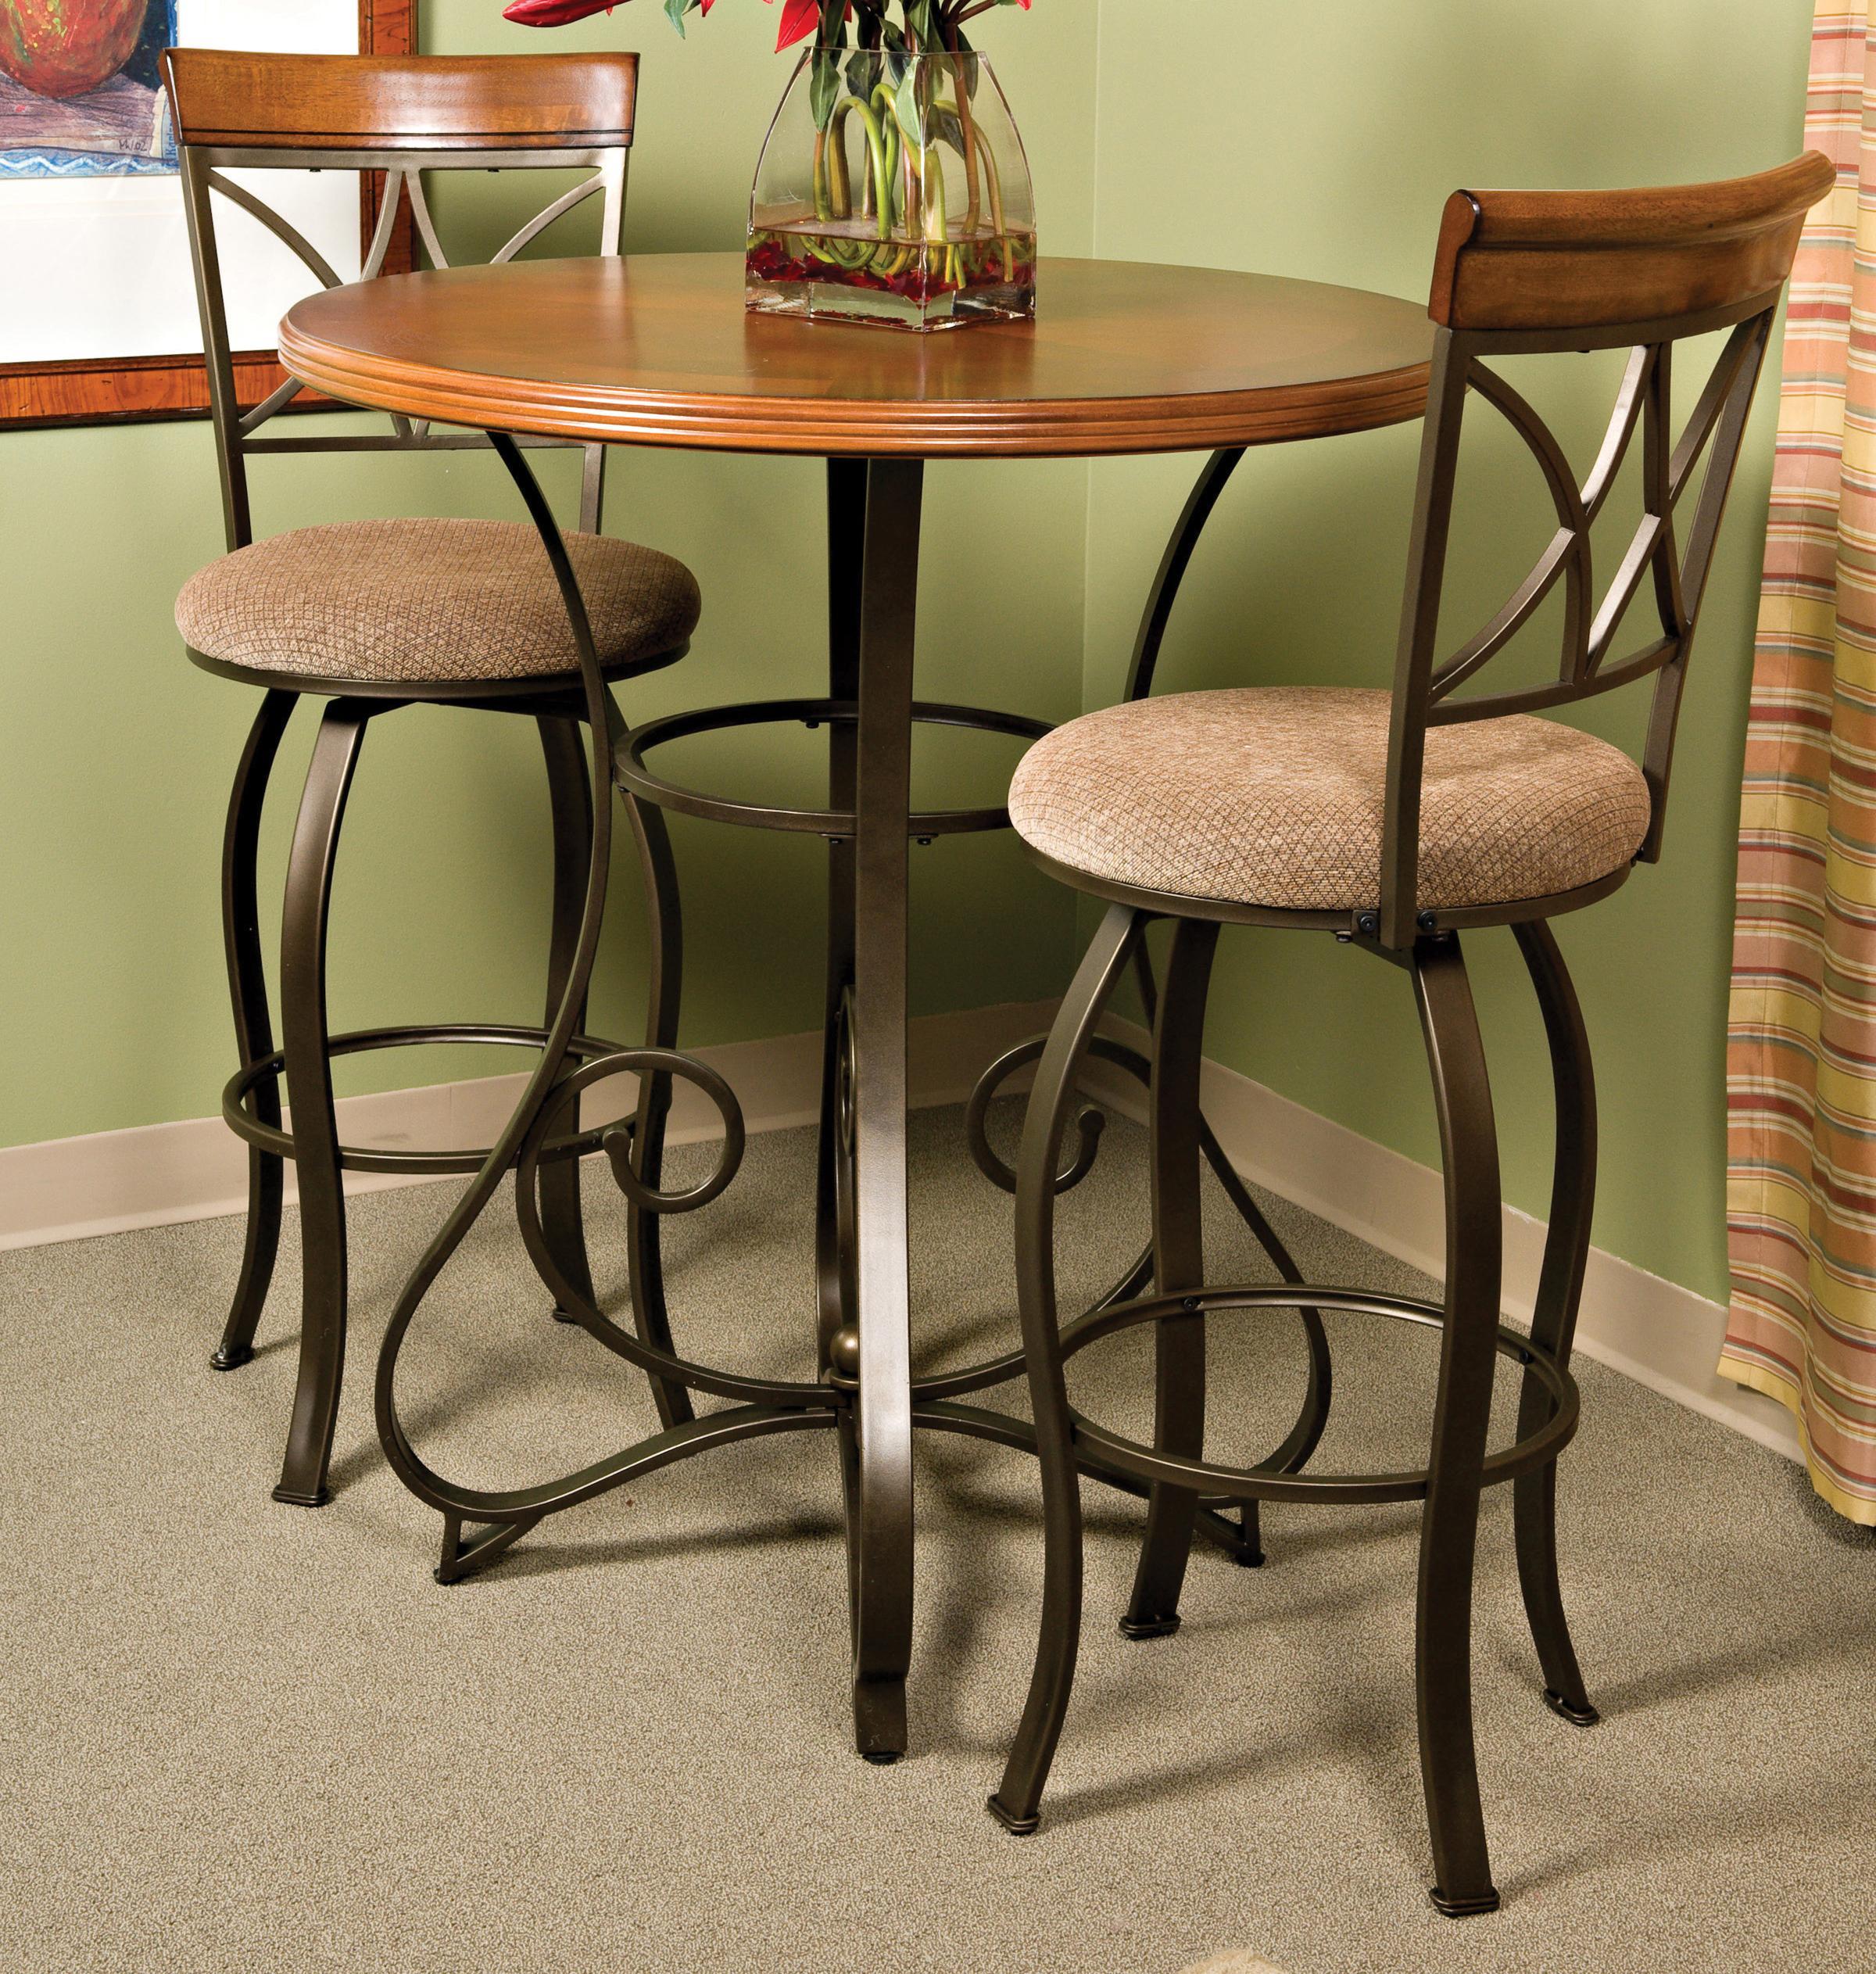 Powell Hamilton 3 Piece Pub Table Set - Item Number: 697-404+2x481